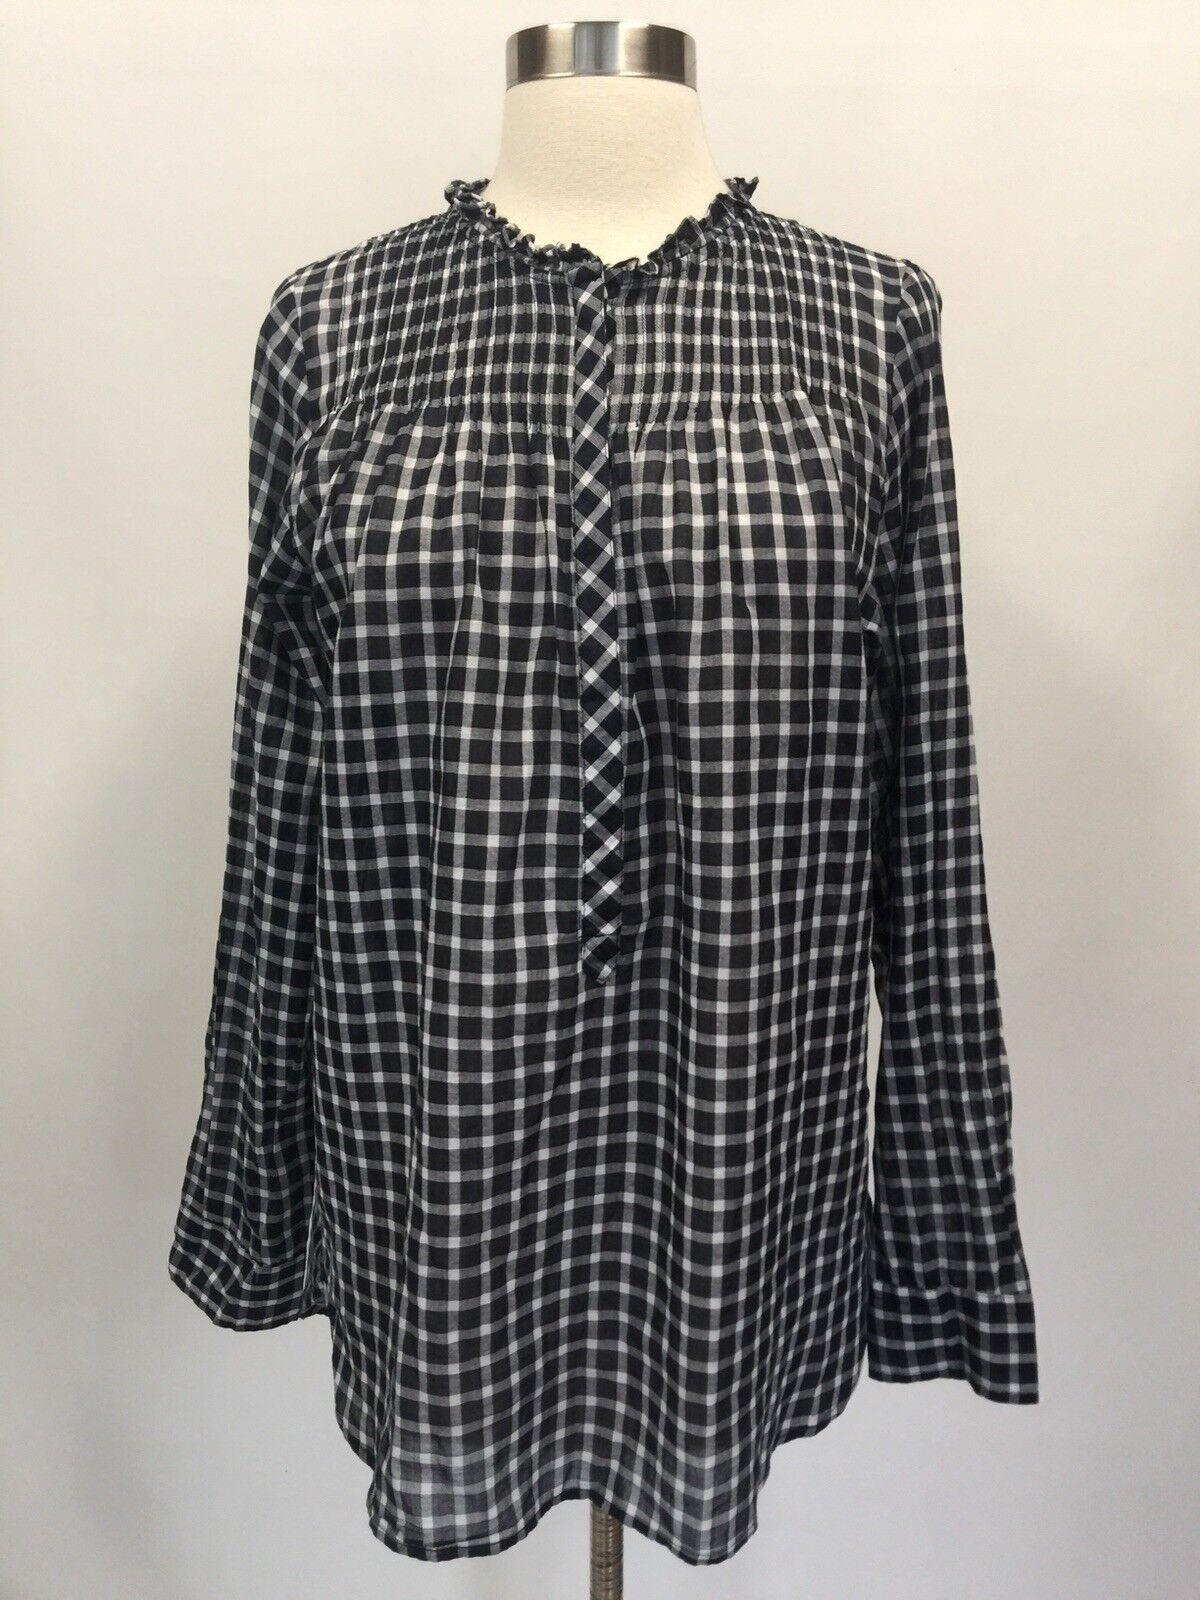 J.Crew Tall Ruffle classic popover shirt in mini windowpane Navy Größe 4T G9925